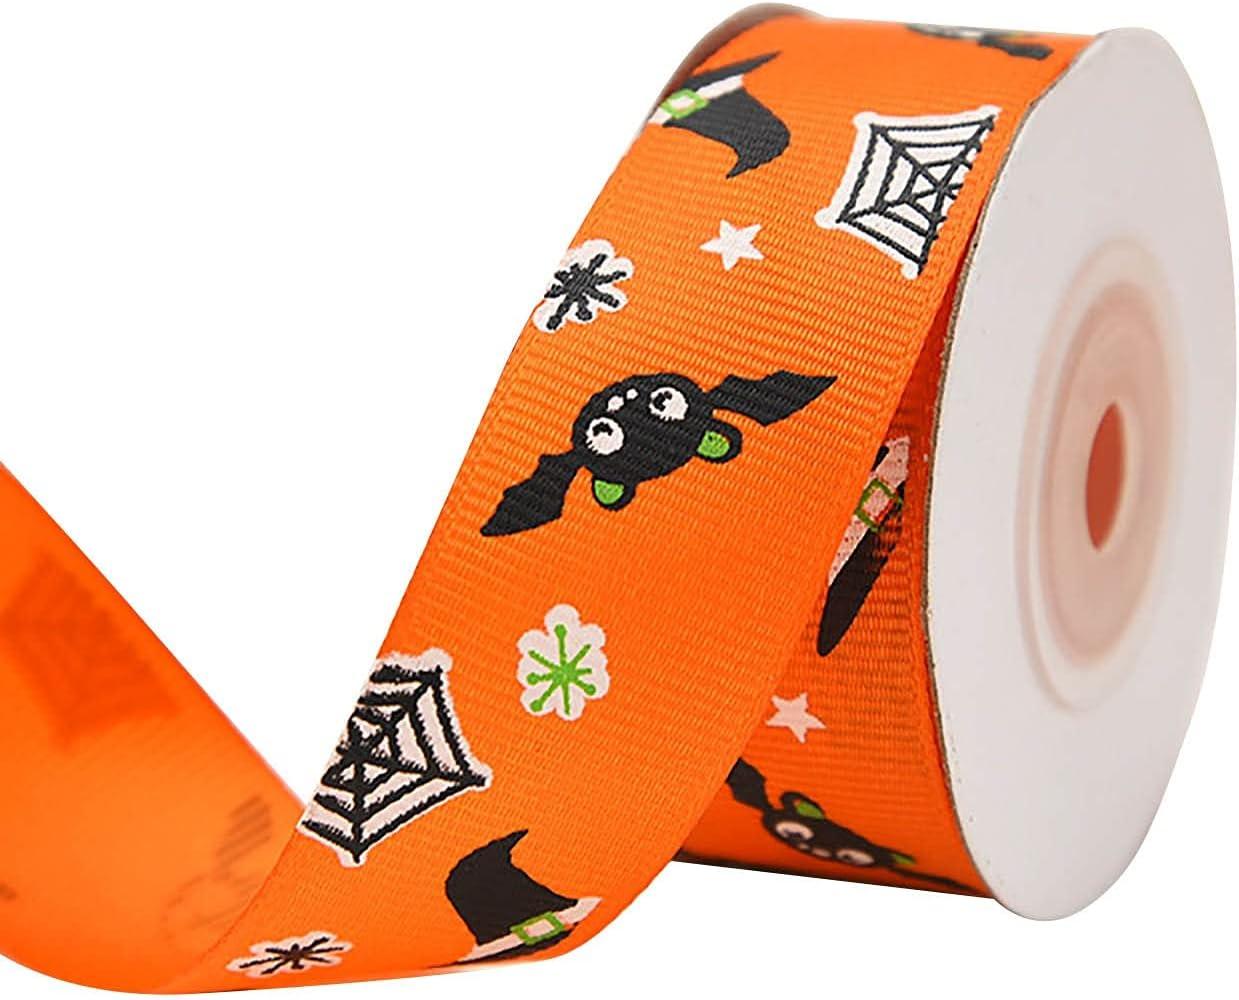 Kairaley Halloween Wired Edge 2021 Ribbons Skull Pumpk Bat Web Max 72% OFF Spider